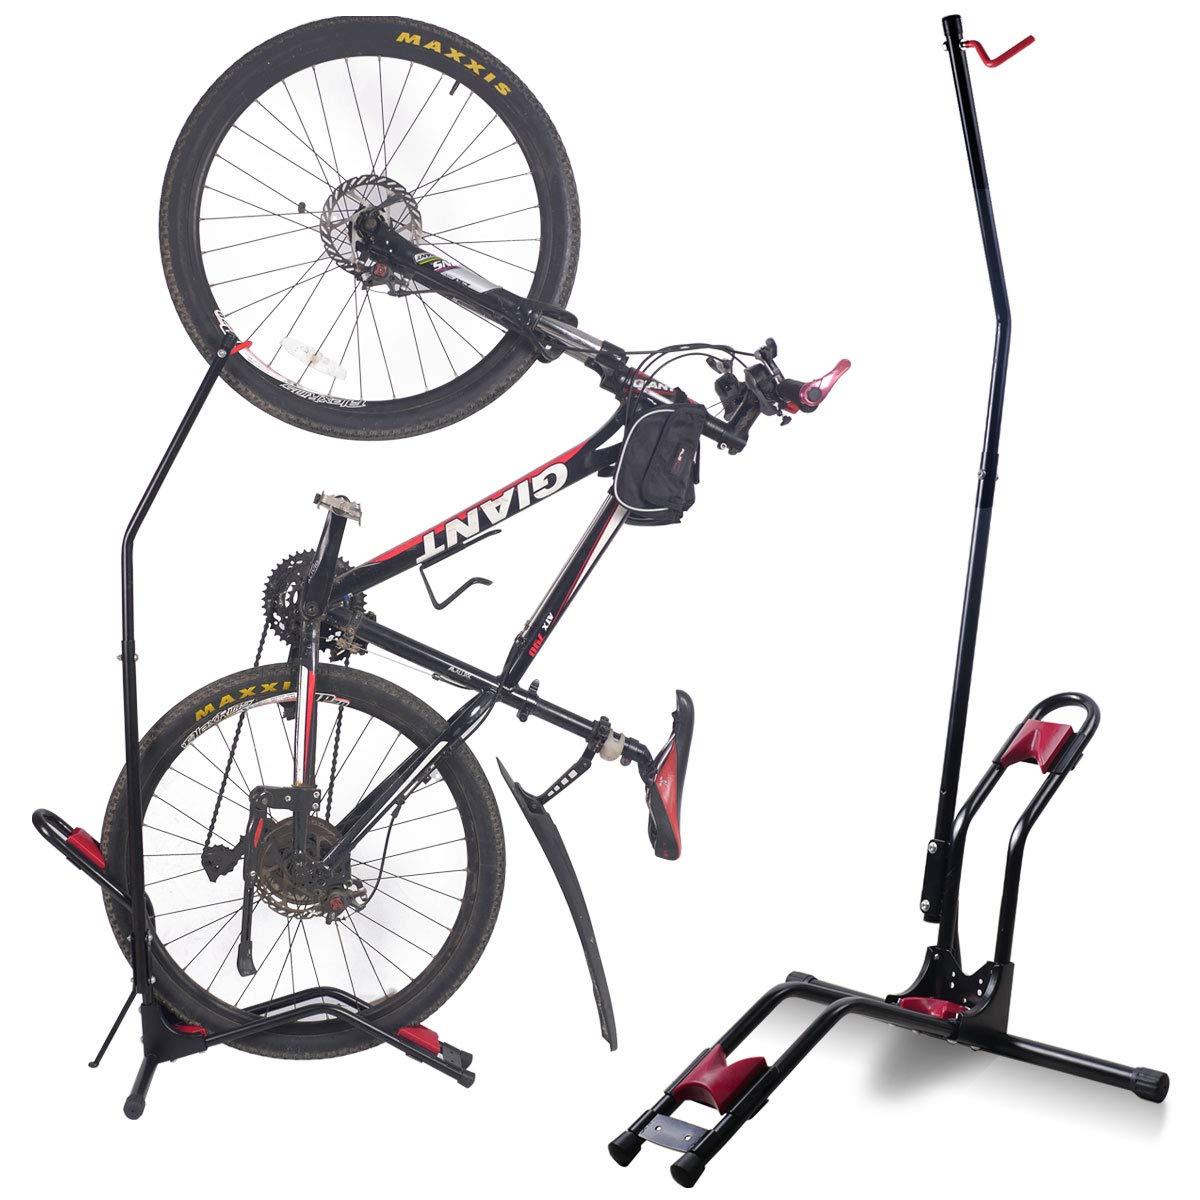 Dinsam Top Vertical Bike Rack Floor Stand, Indoor Bicycle Storage Mount, Bike Floor Stand - Fits Nearly All Bikes & Frees 4 Feet of Floor Space